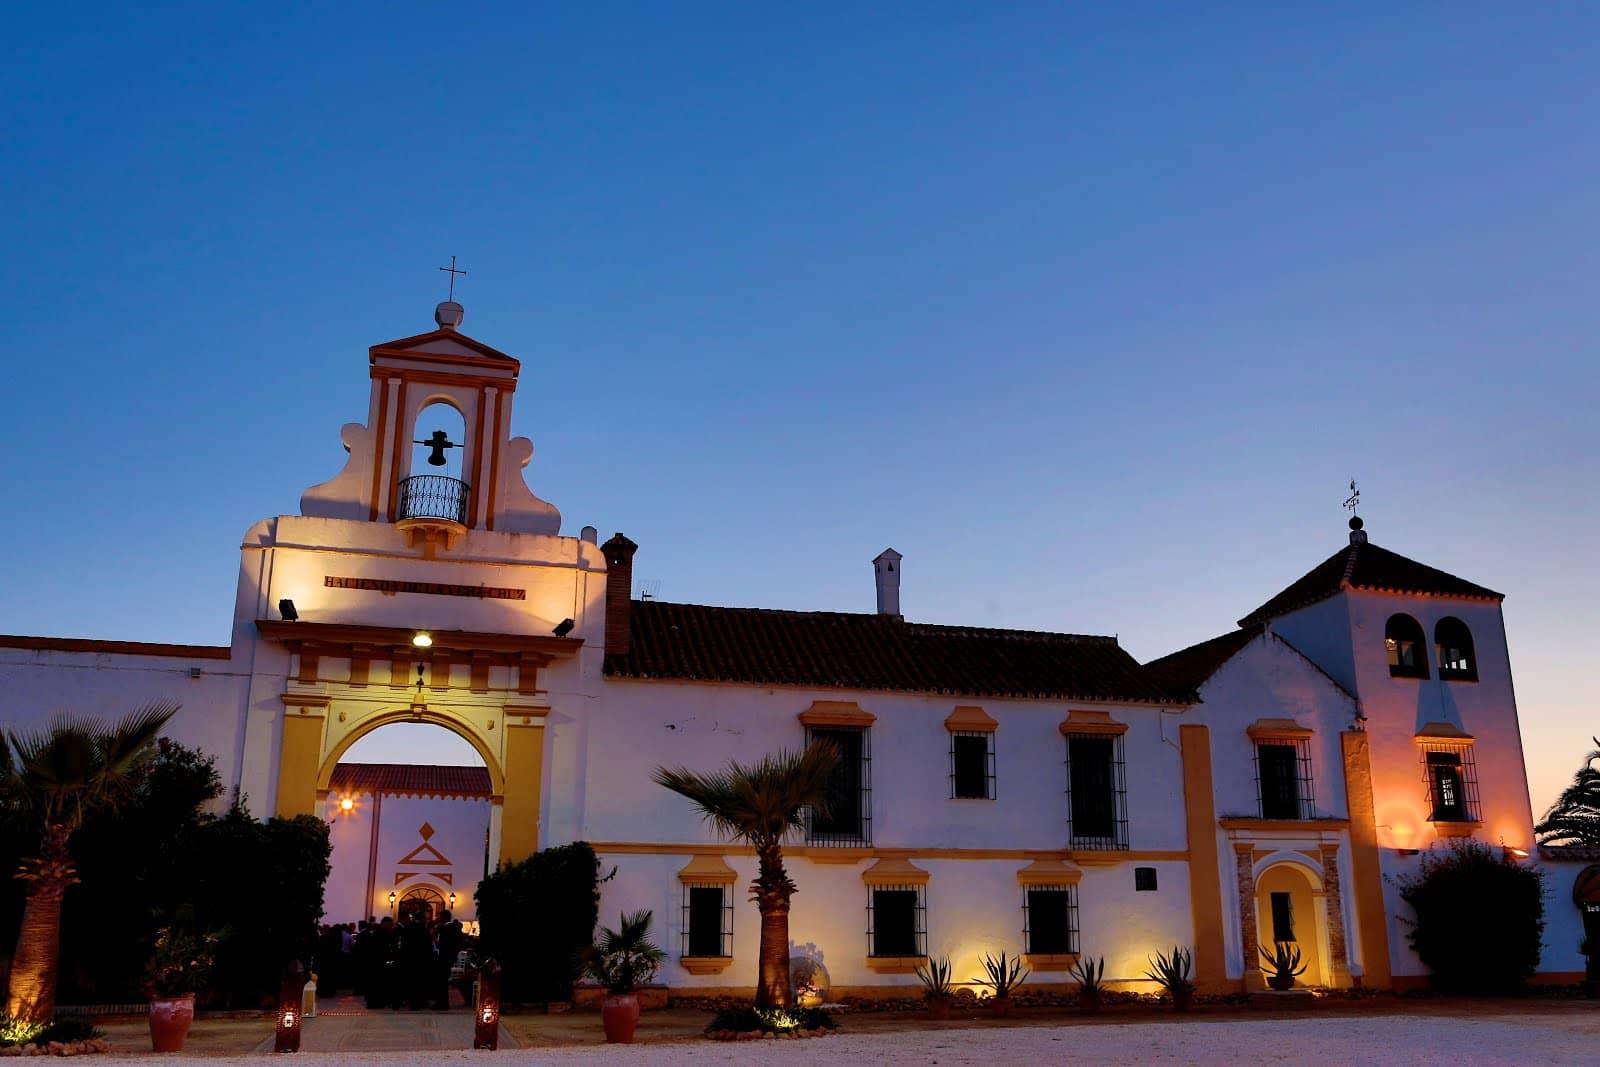 Hacienda Vera Cruz